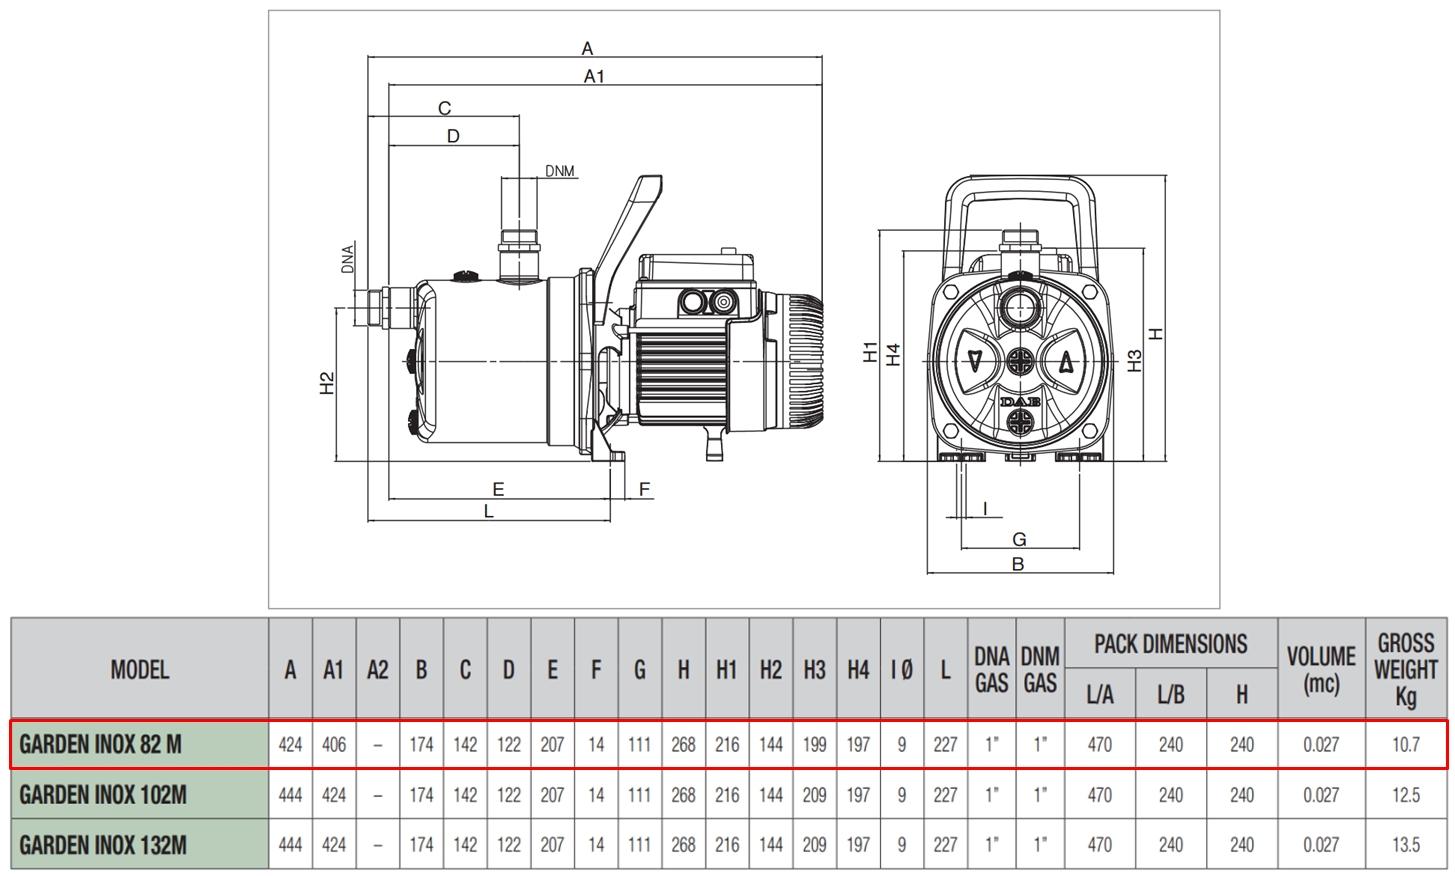 dab gardenjet inox 82 m gartenpumpe 3600 l h f rderh he 47 0 m 230 v. Black Bedroom Furniture Sets. Home Design Ideas